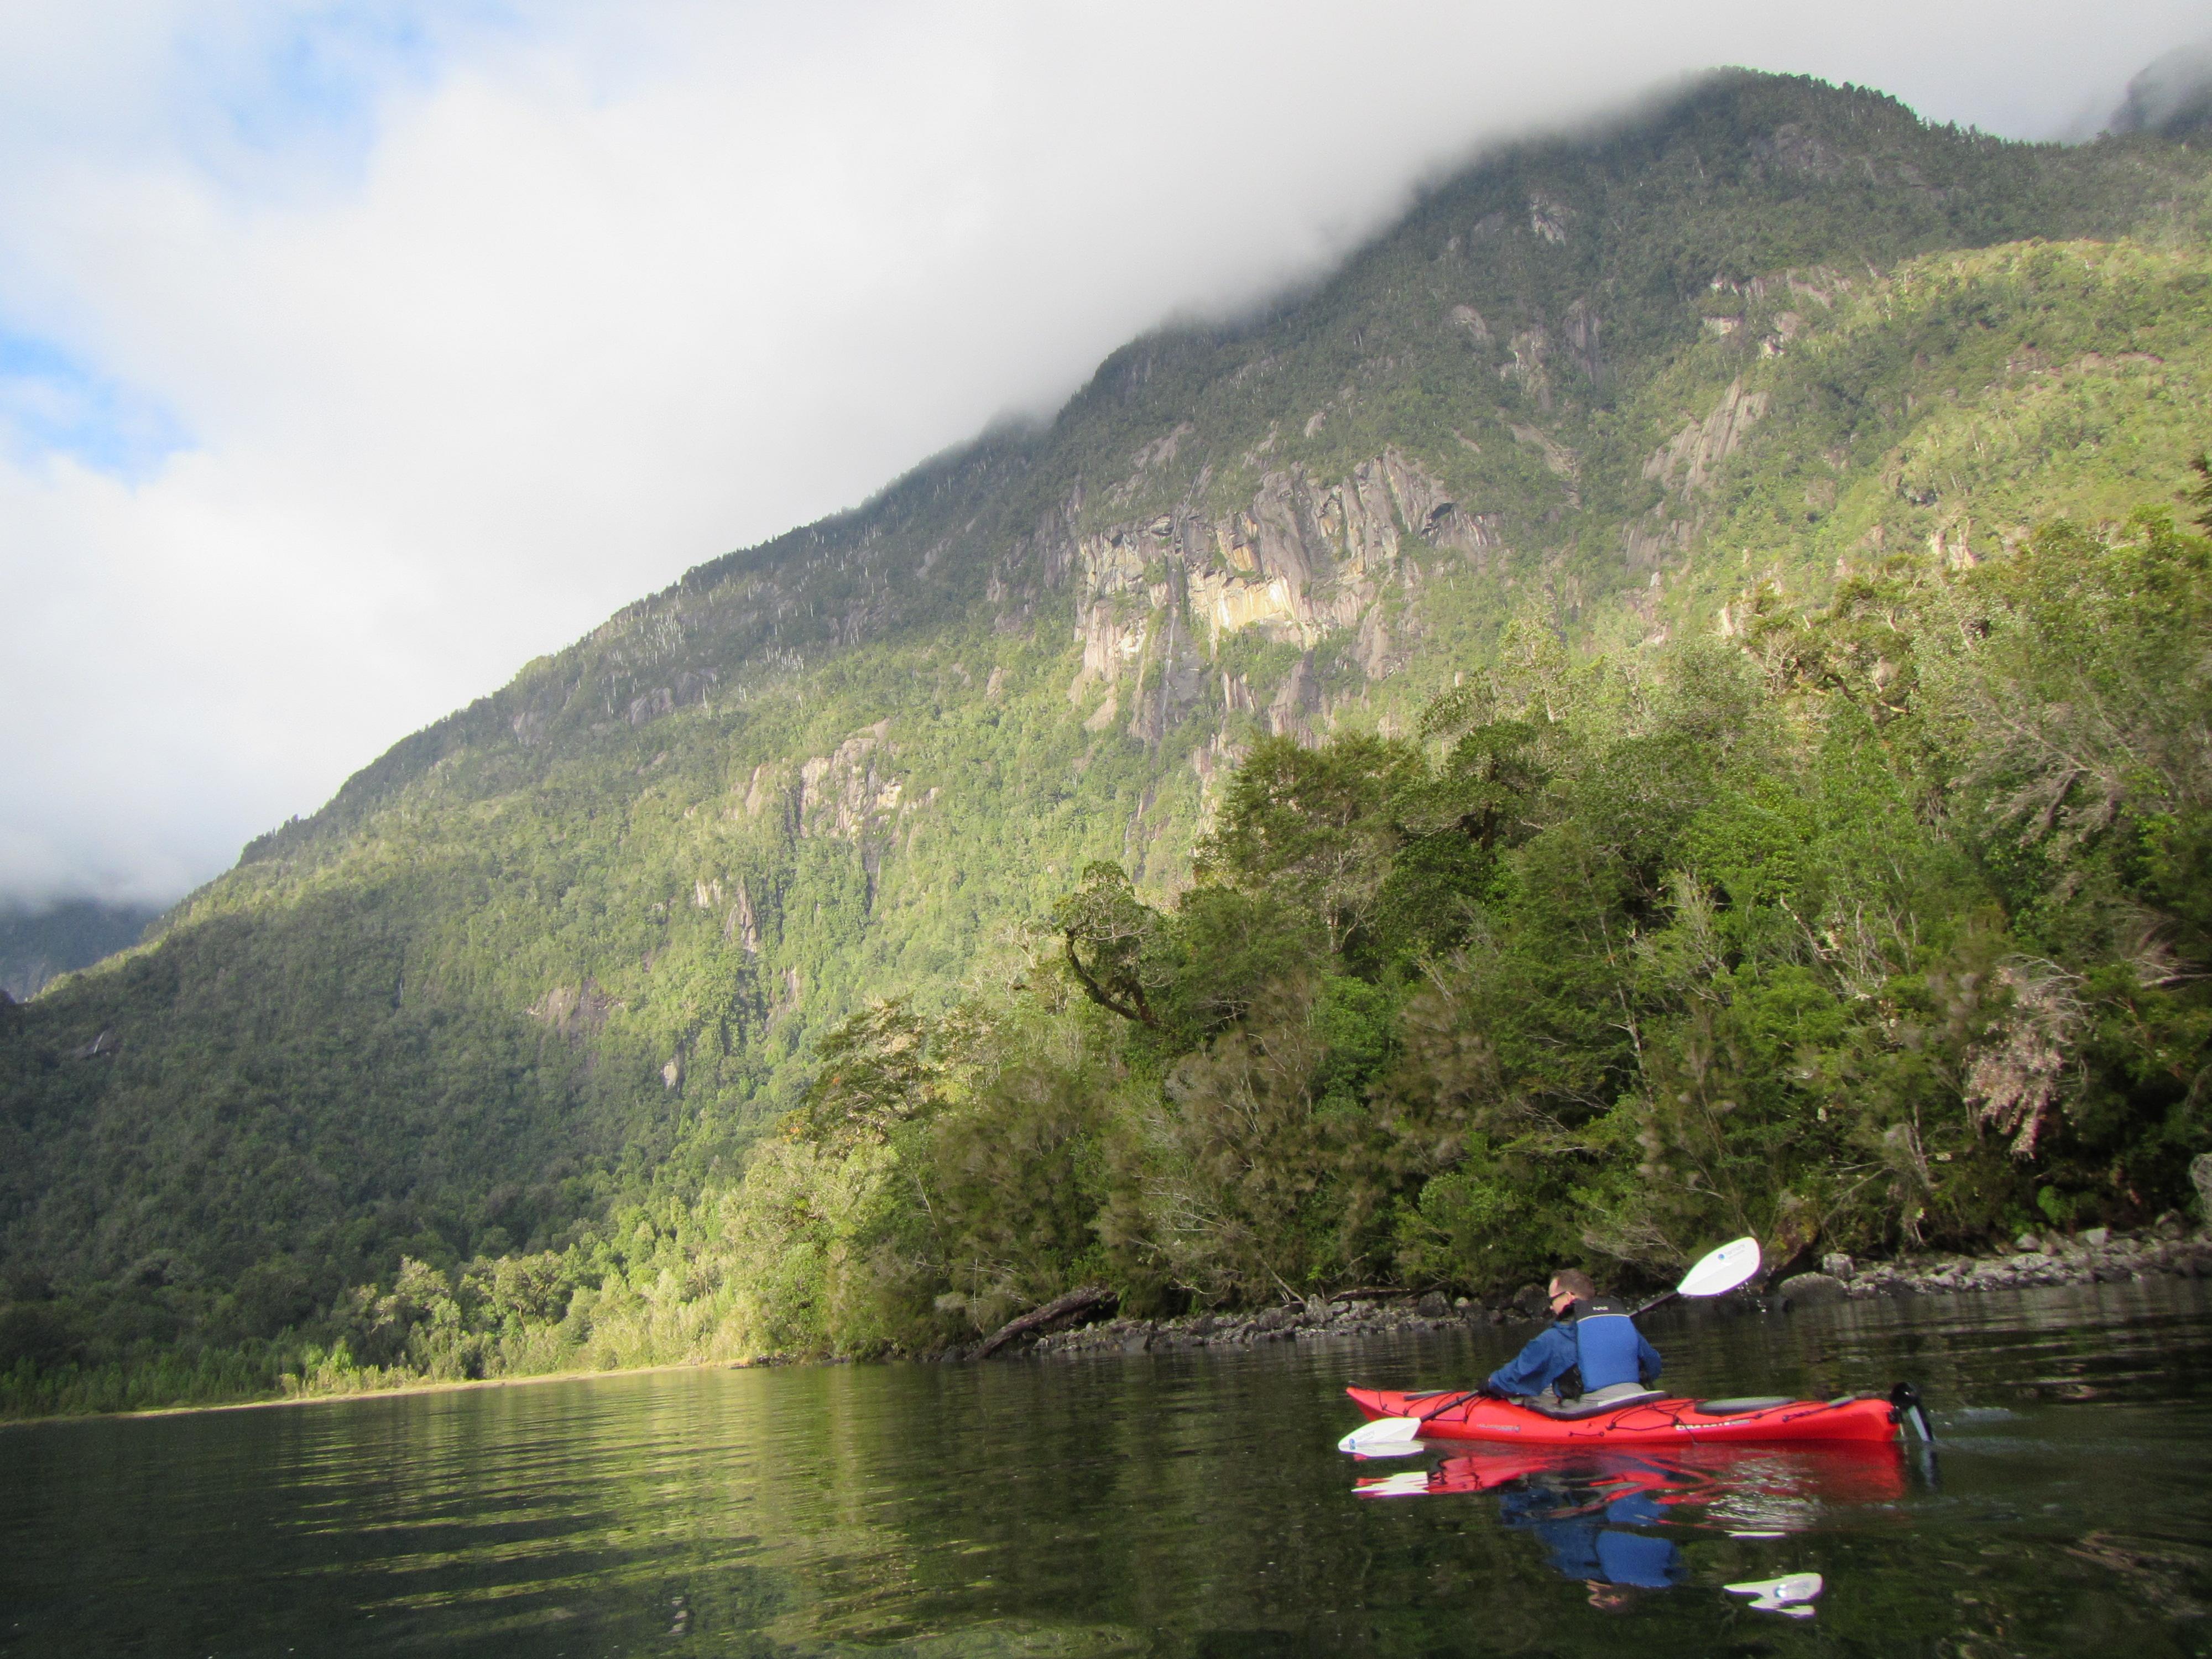 Pumalin Park Fjord of Patagonia